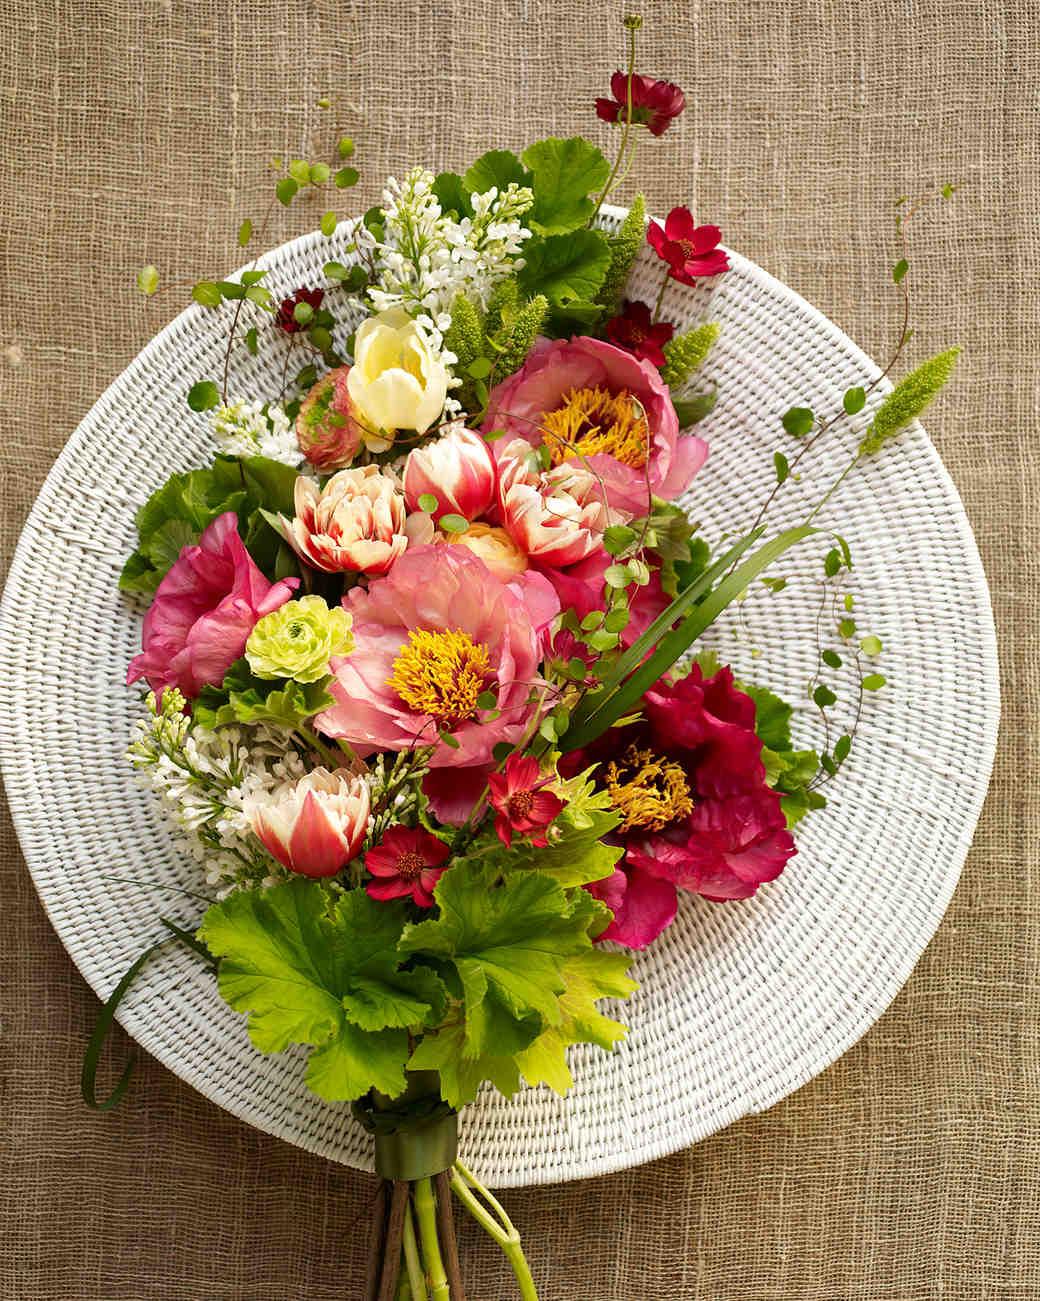 spring-flower-expert-green-vase-bouquet-sp11-0315.jpg